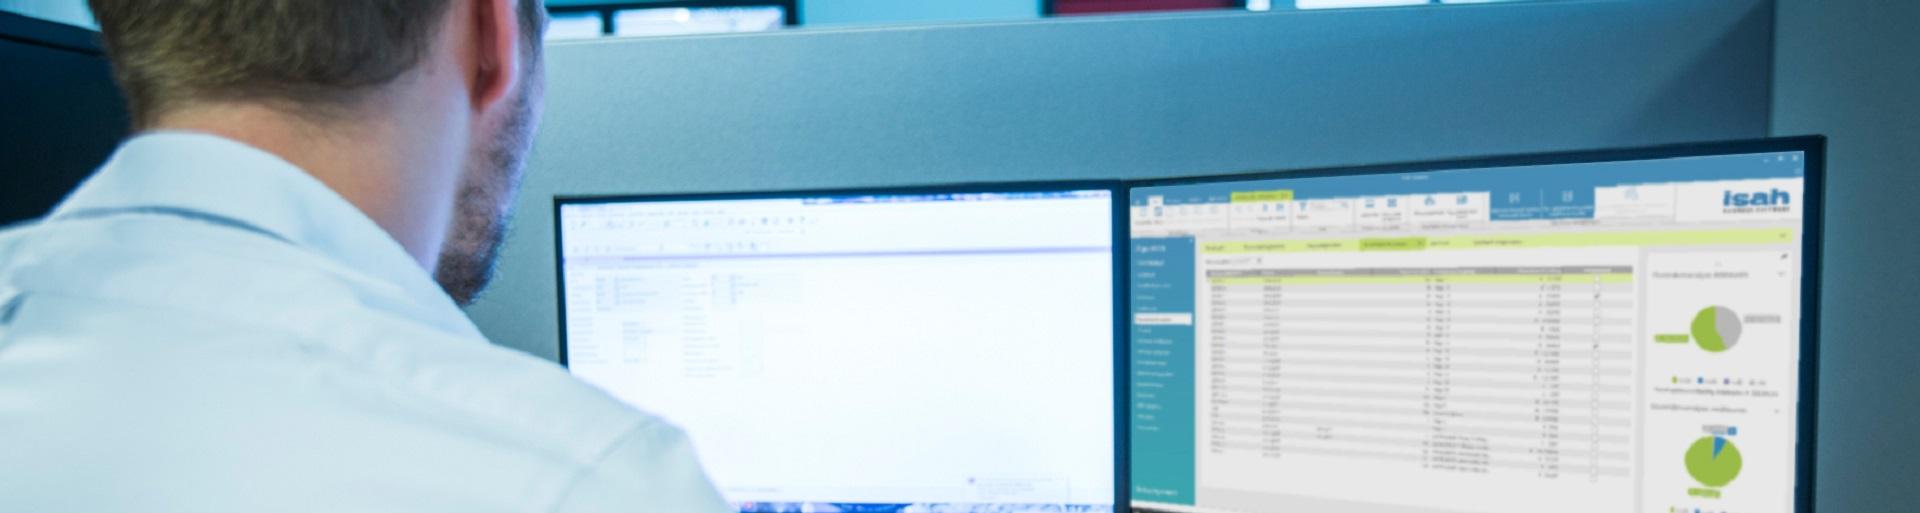 erp-software-isah-waarom-kpi-controller-maakindustrie